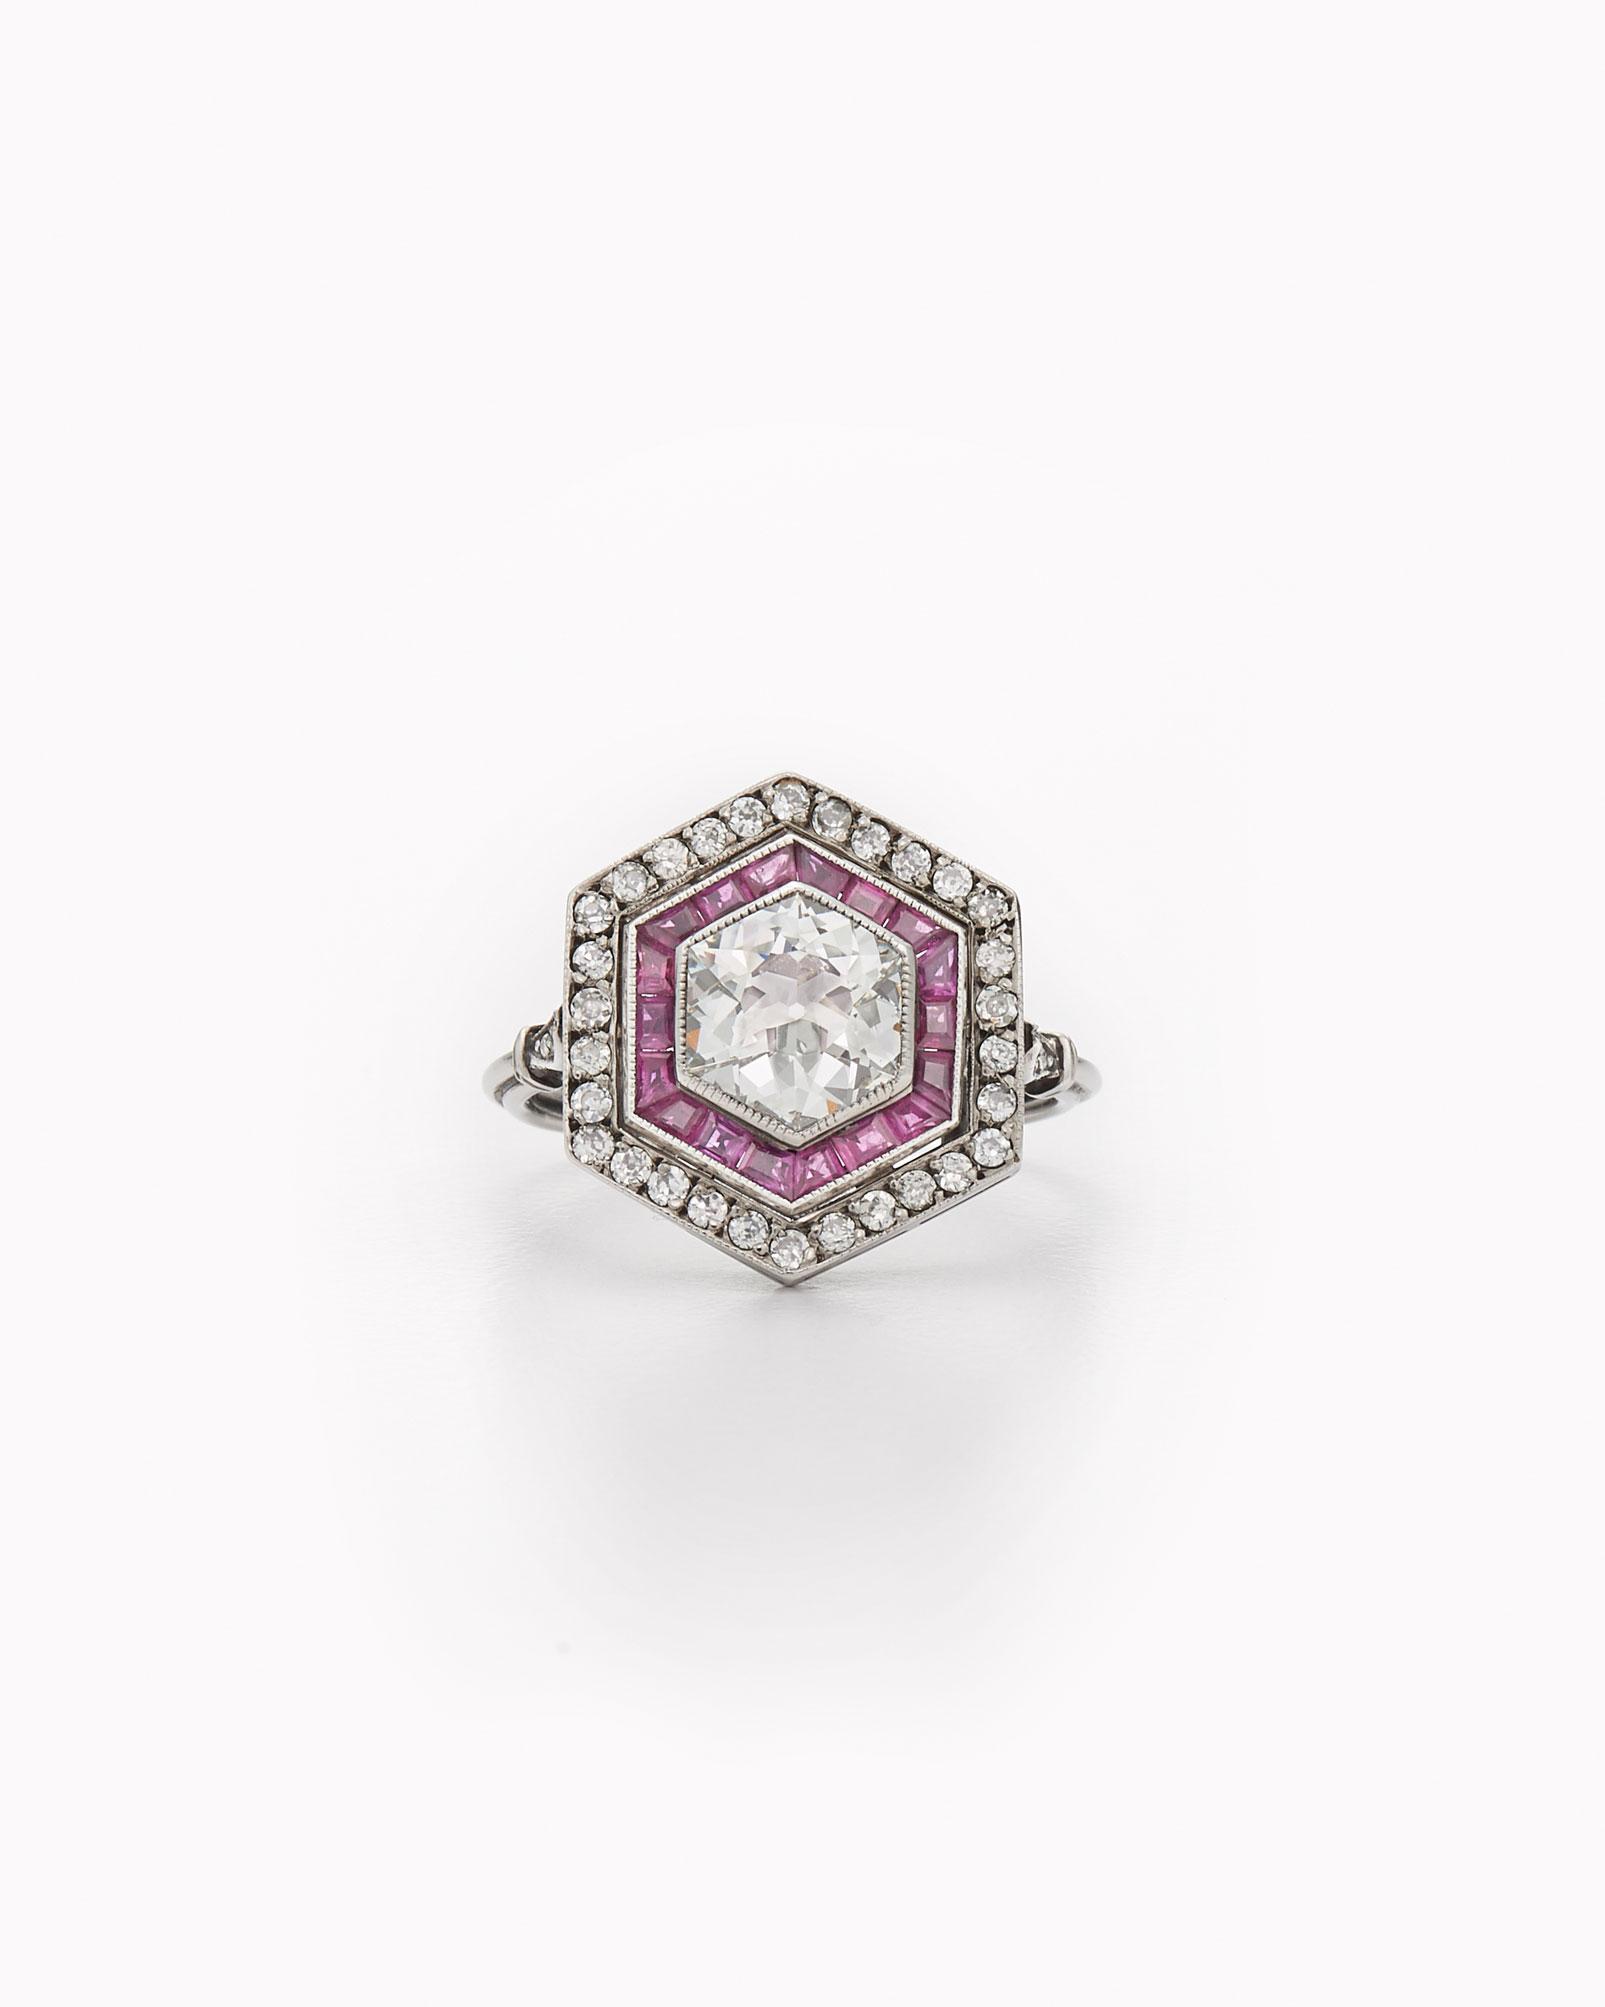 celebrity-rings-fred-leighton-ashlee-simpson-0316.jpg